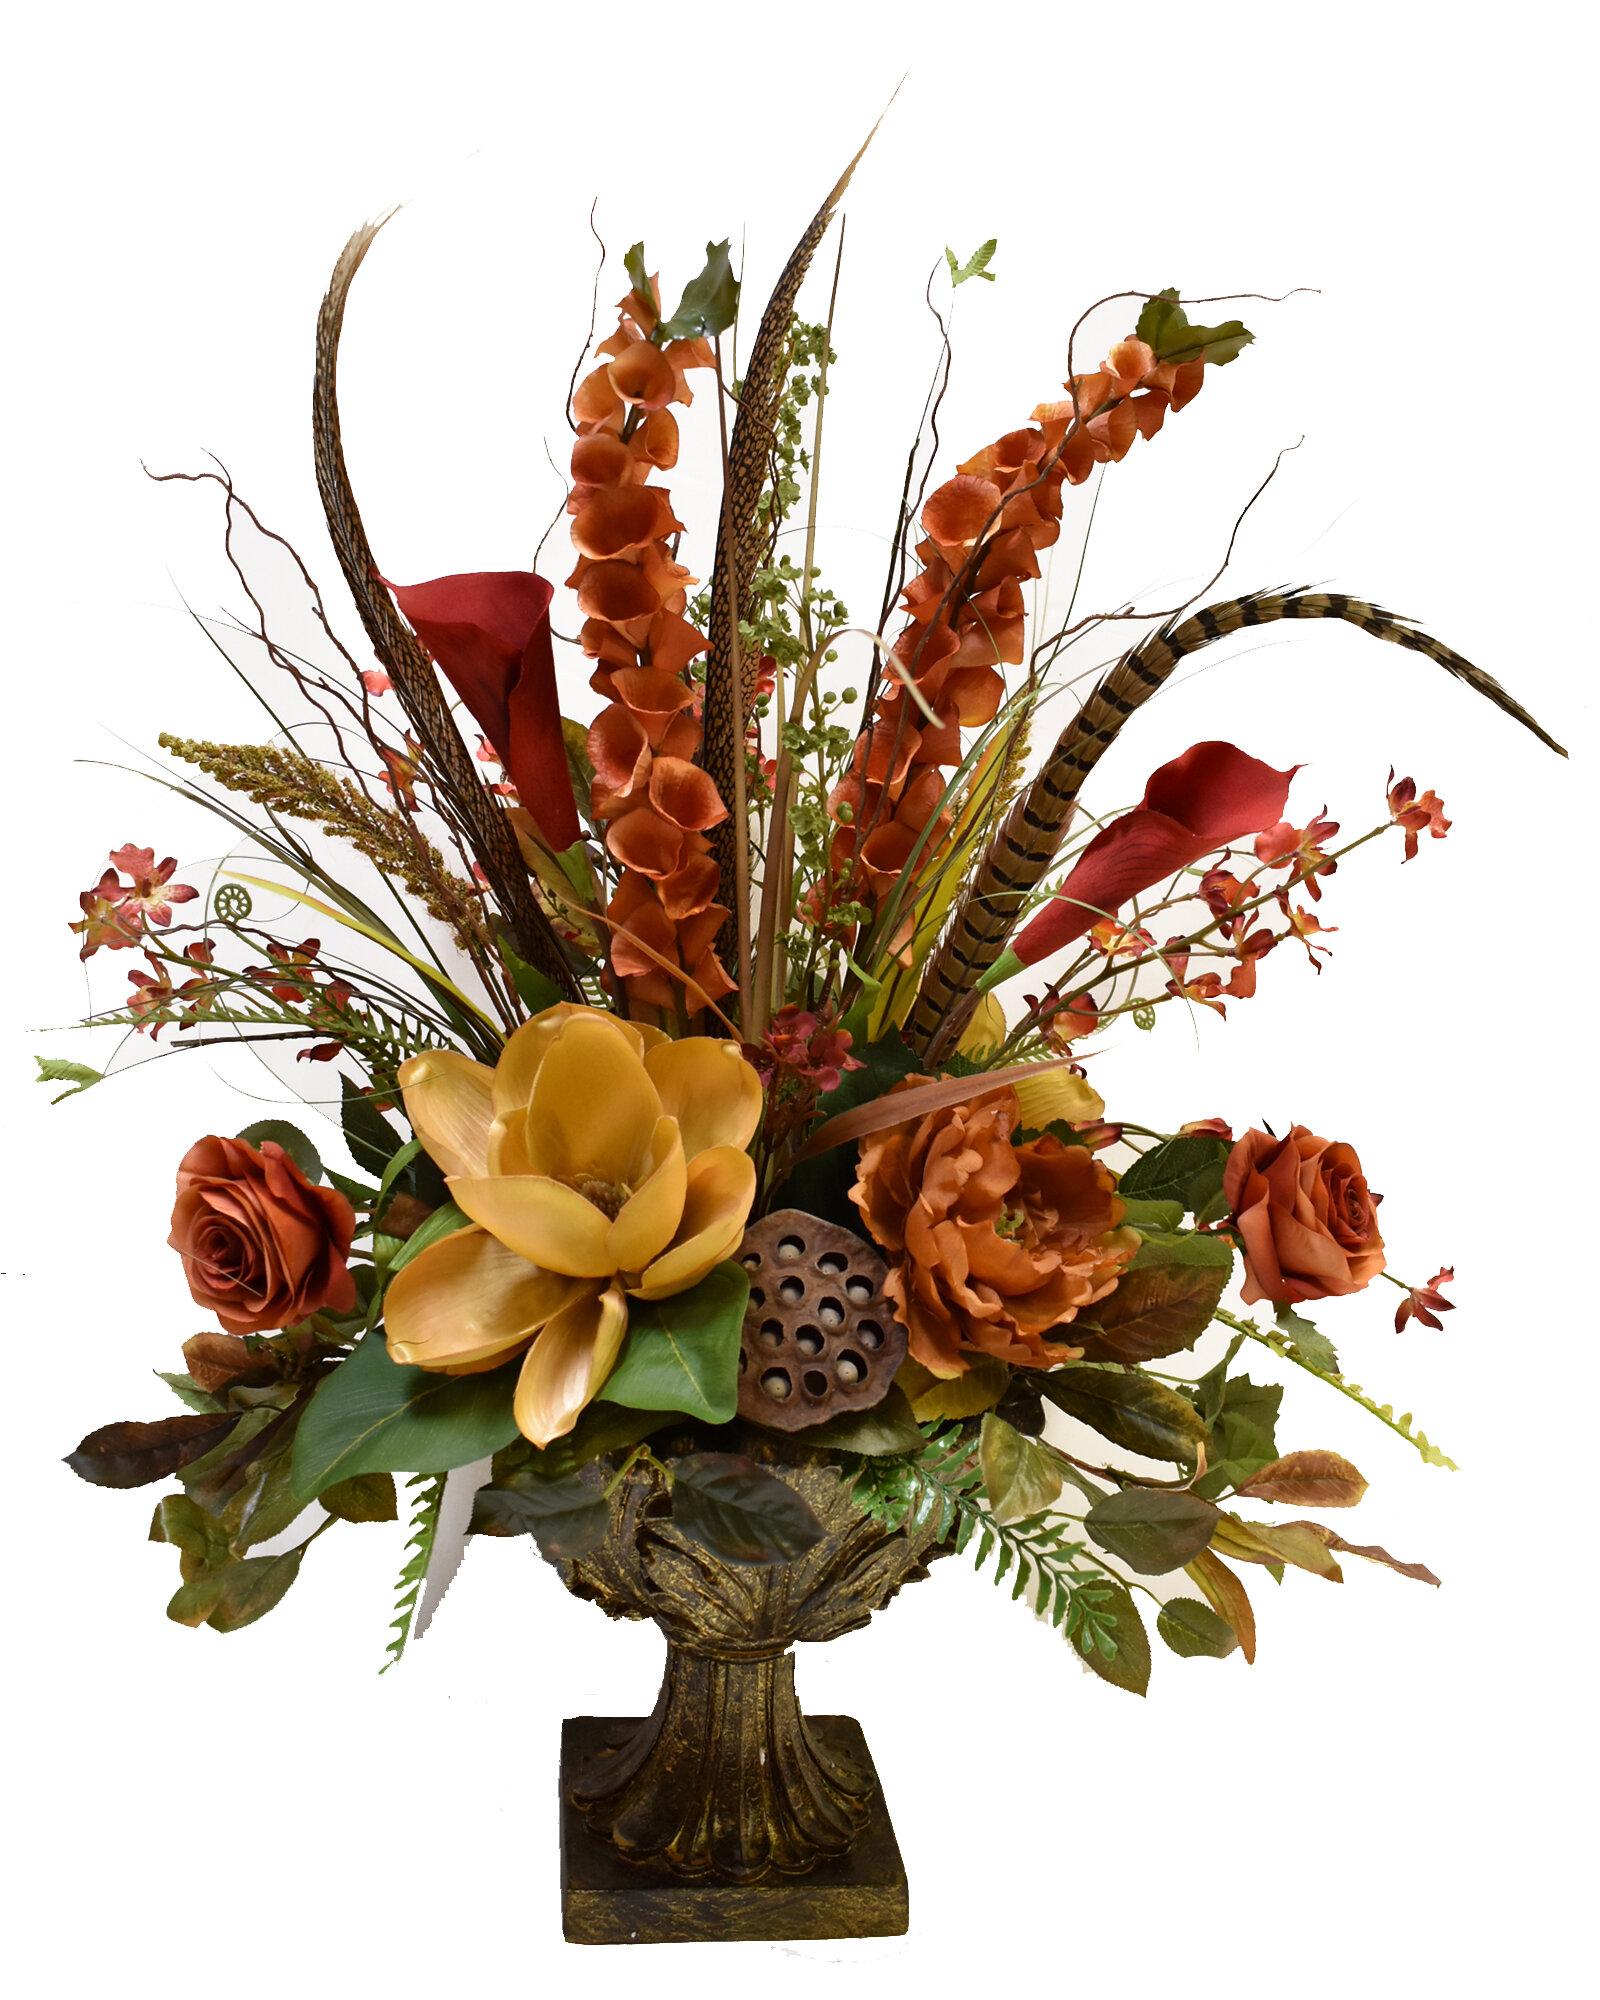 Floral Home Decor Grande Silk Flower Floral Arrangement In Decorative Vase Reviews Wayfair